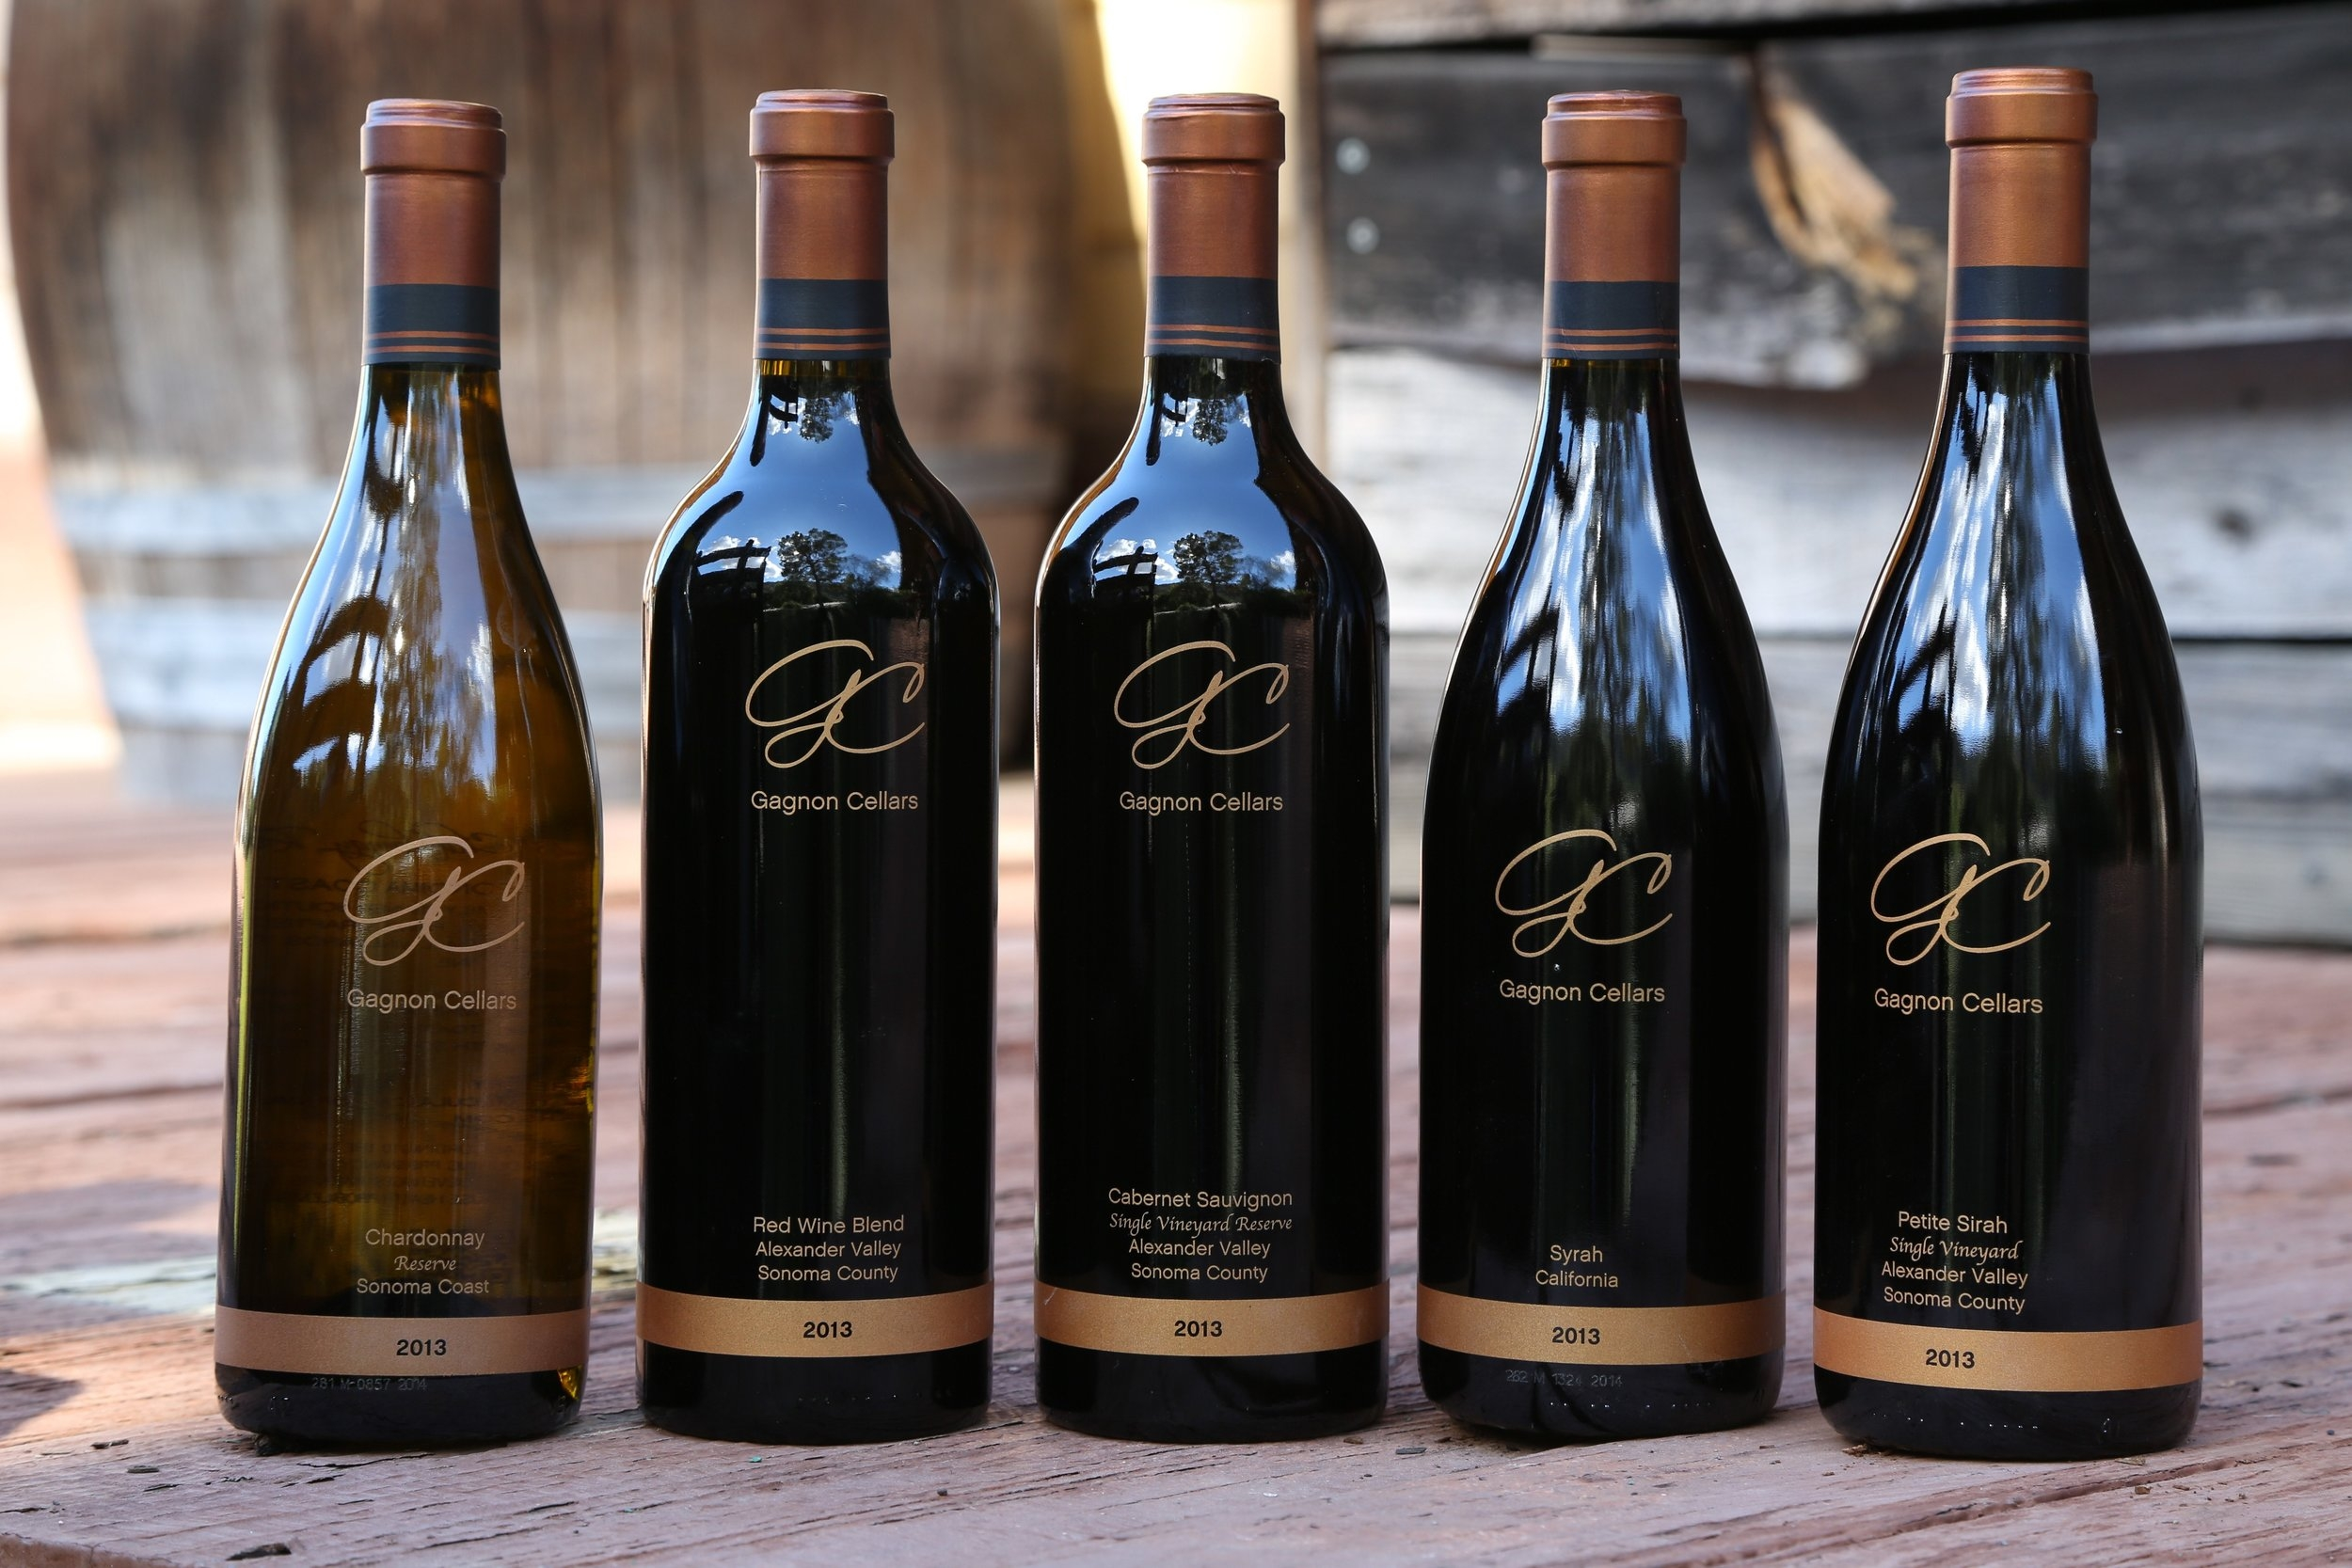 Order Gagnon cellars award winning wines!